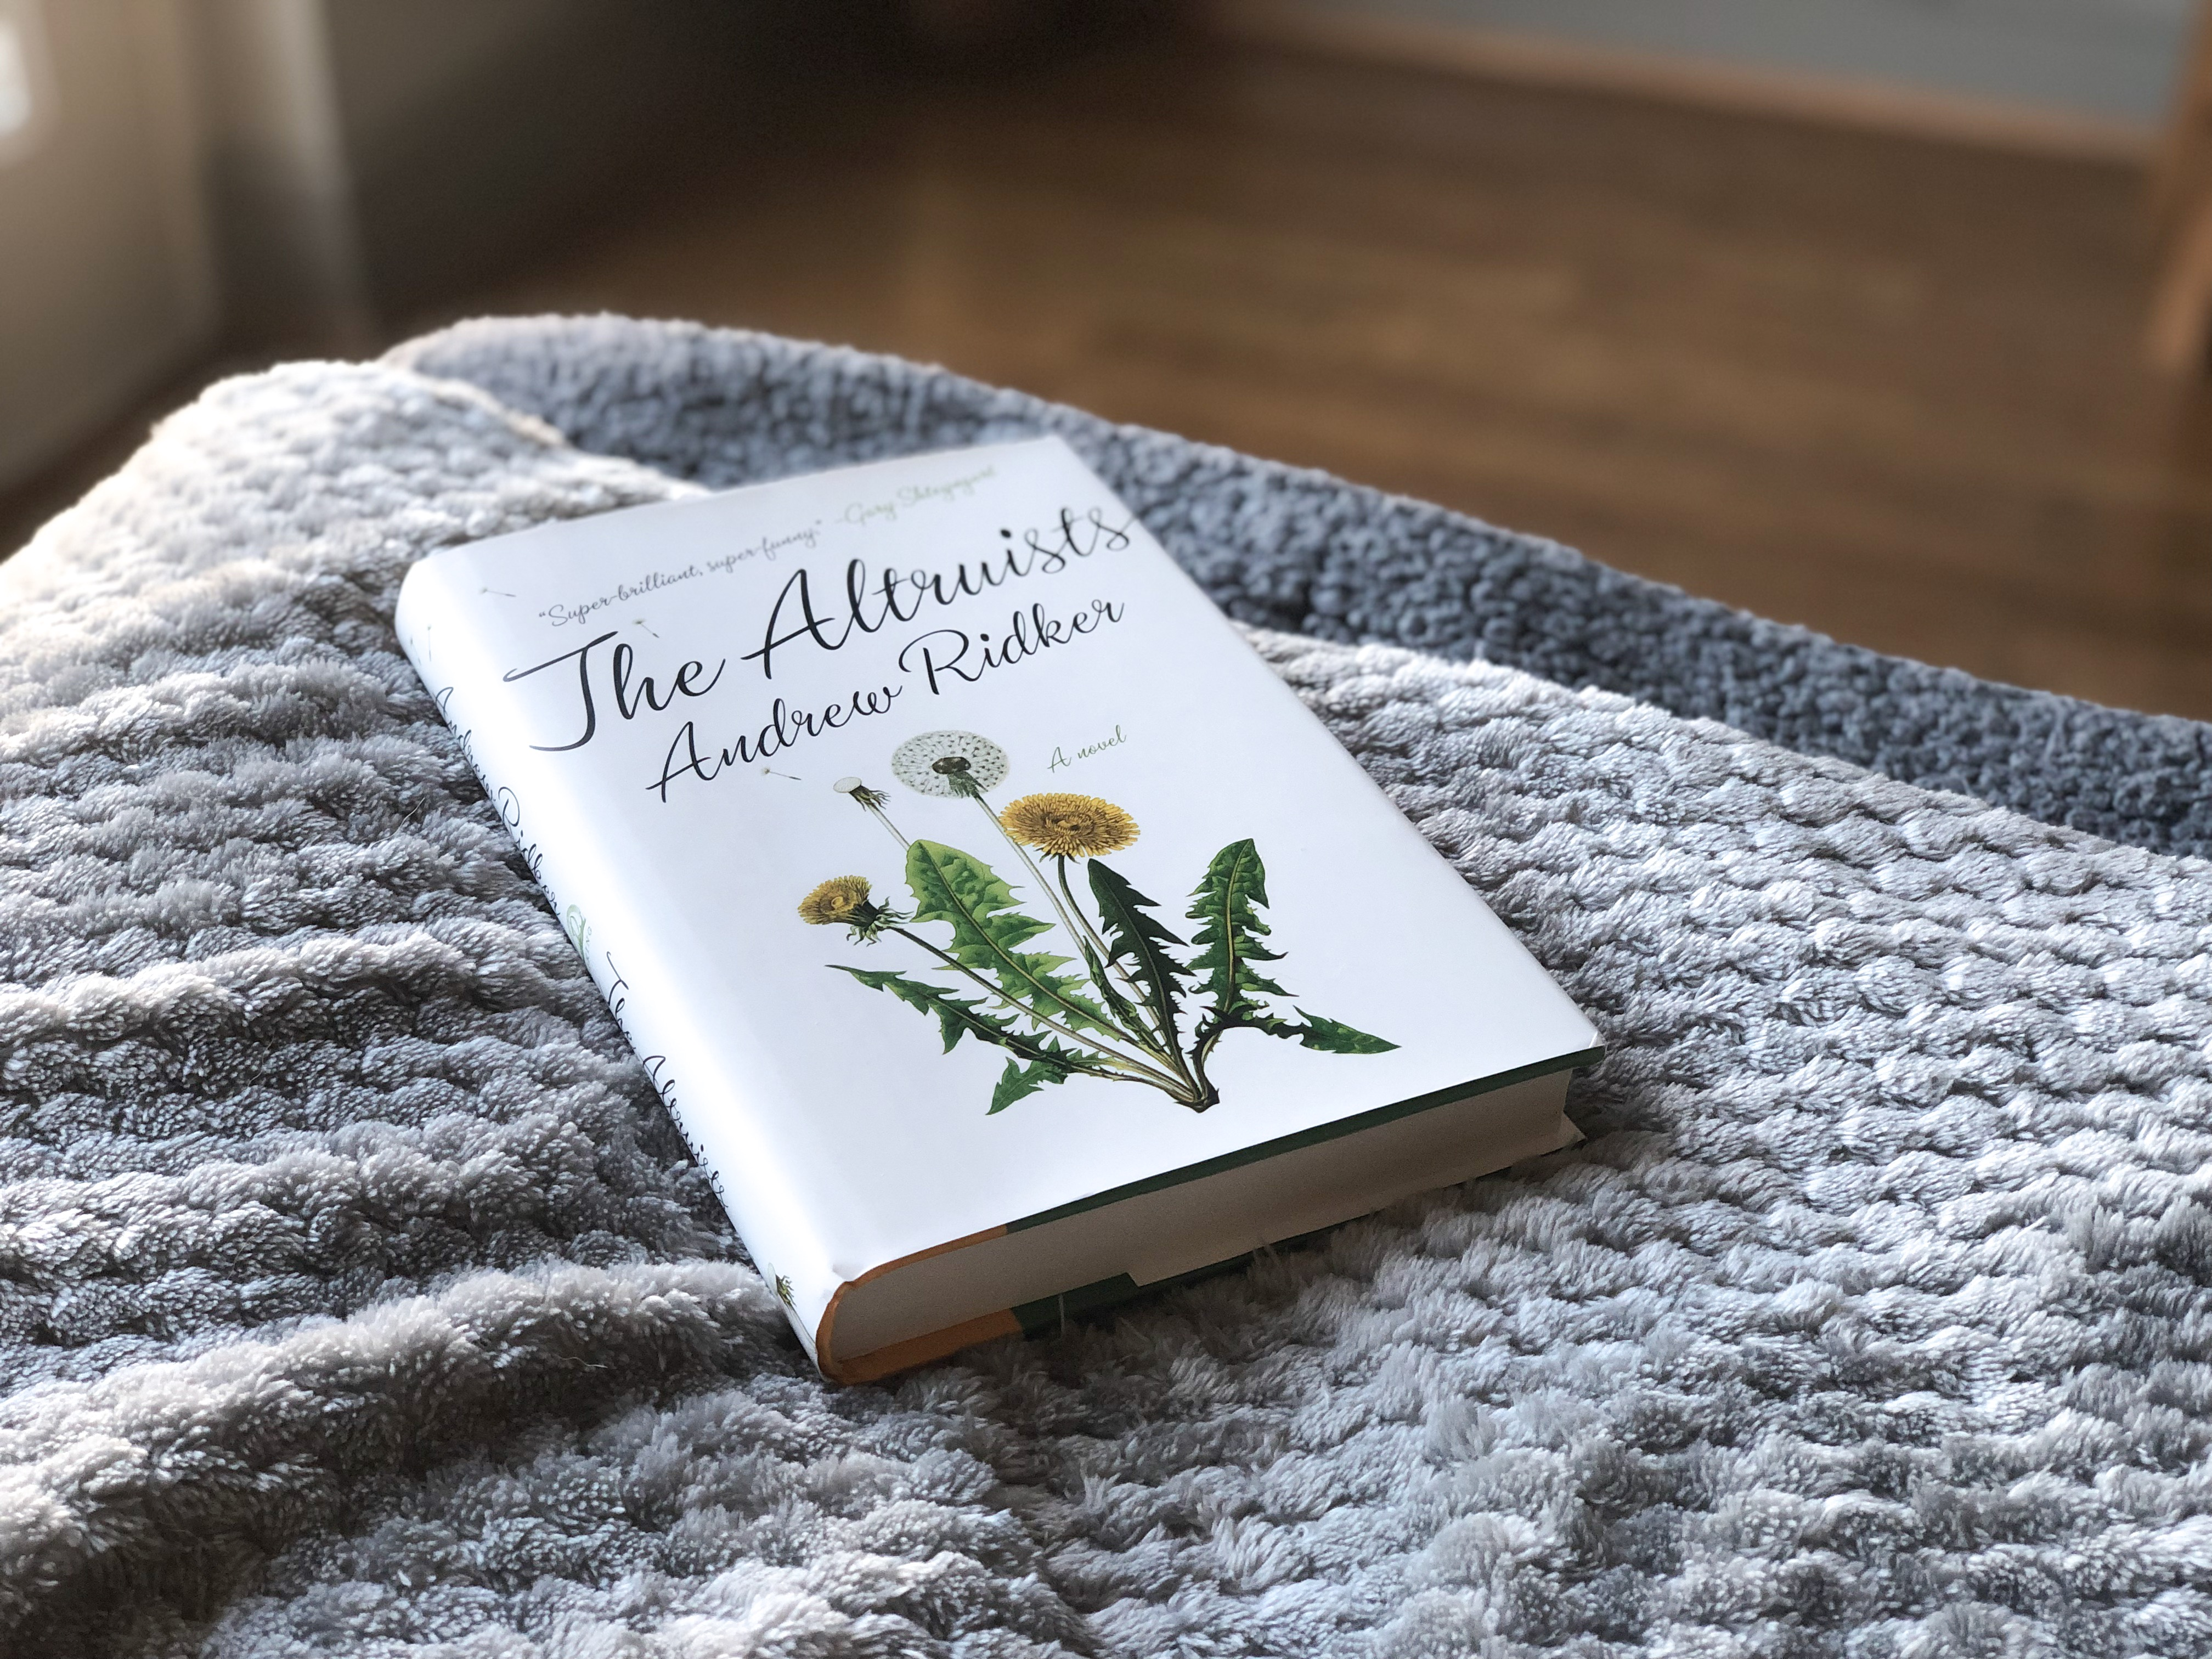 The Altruists, Andrew Ridker